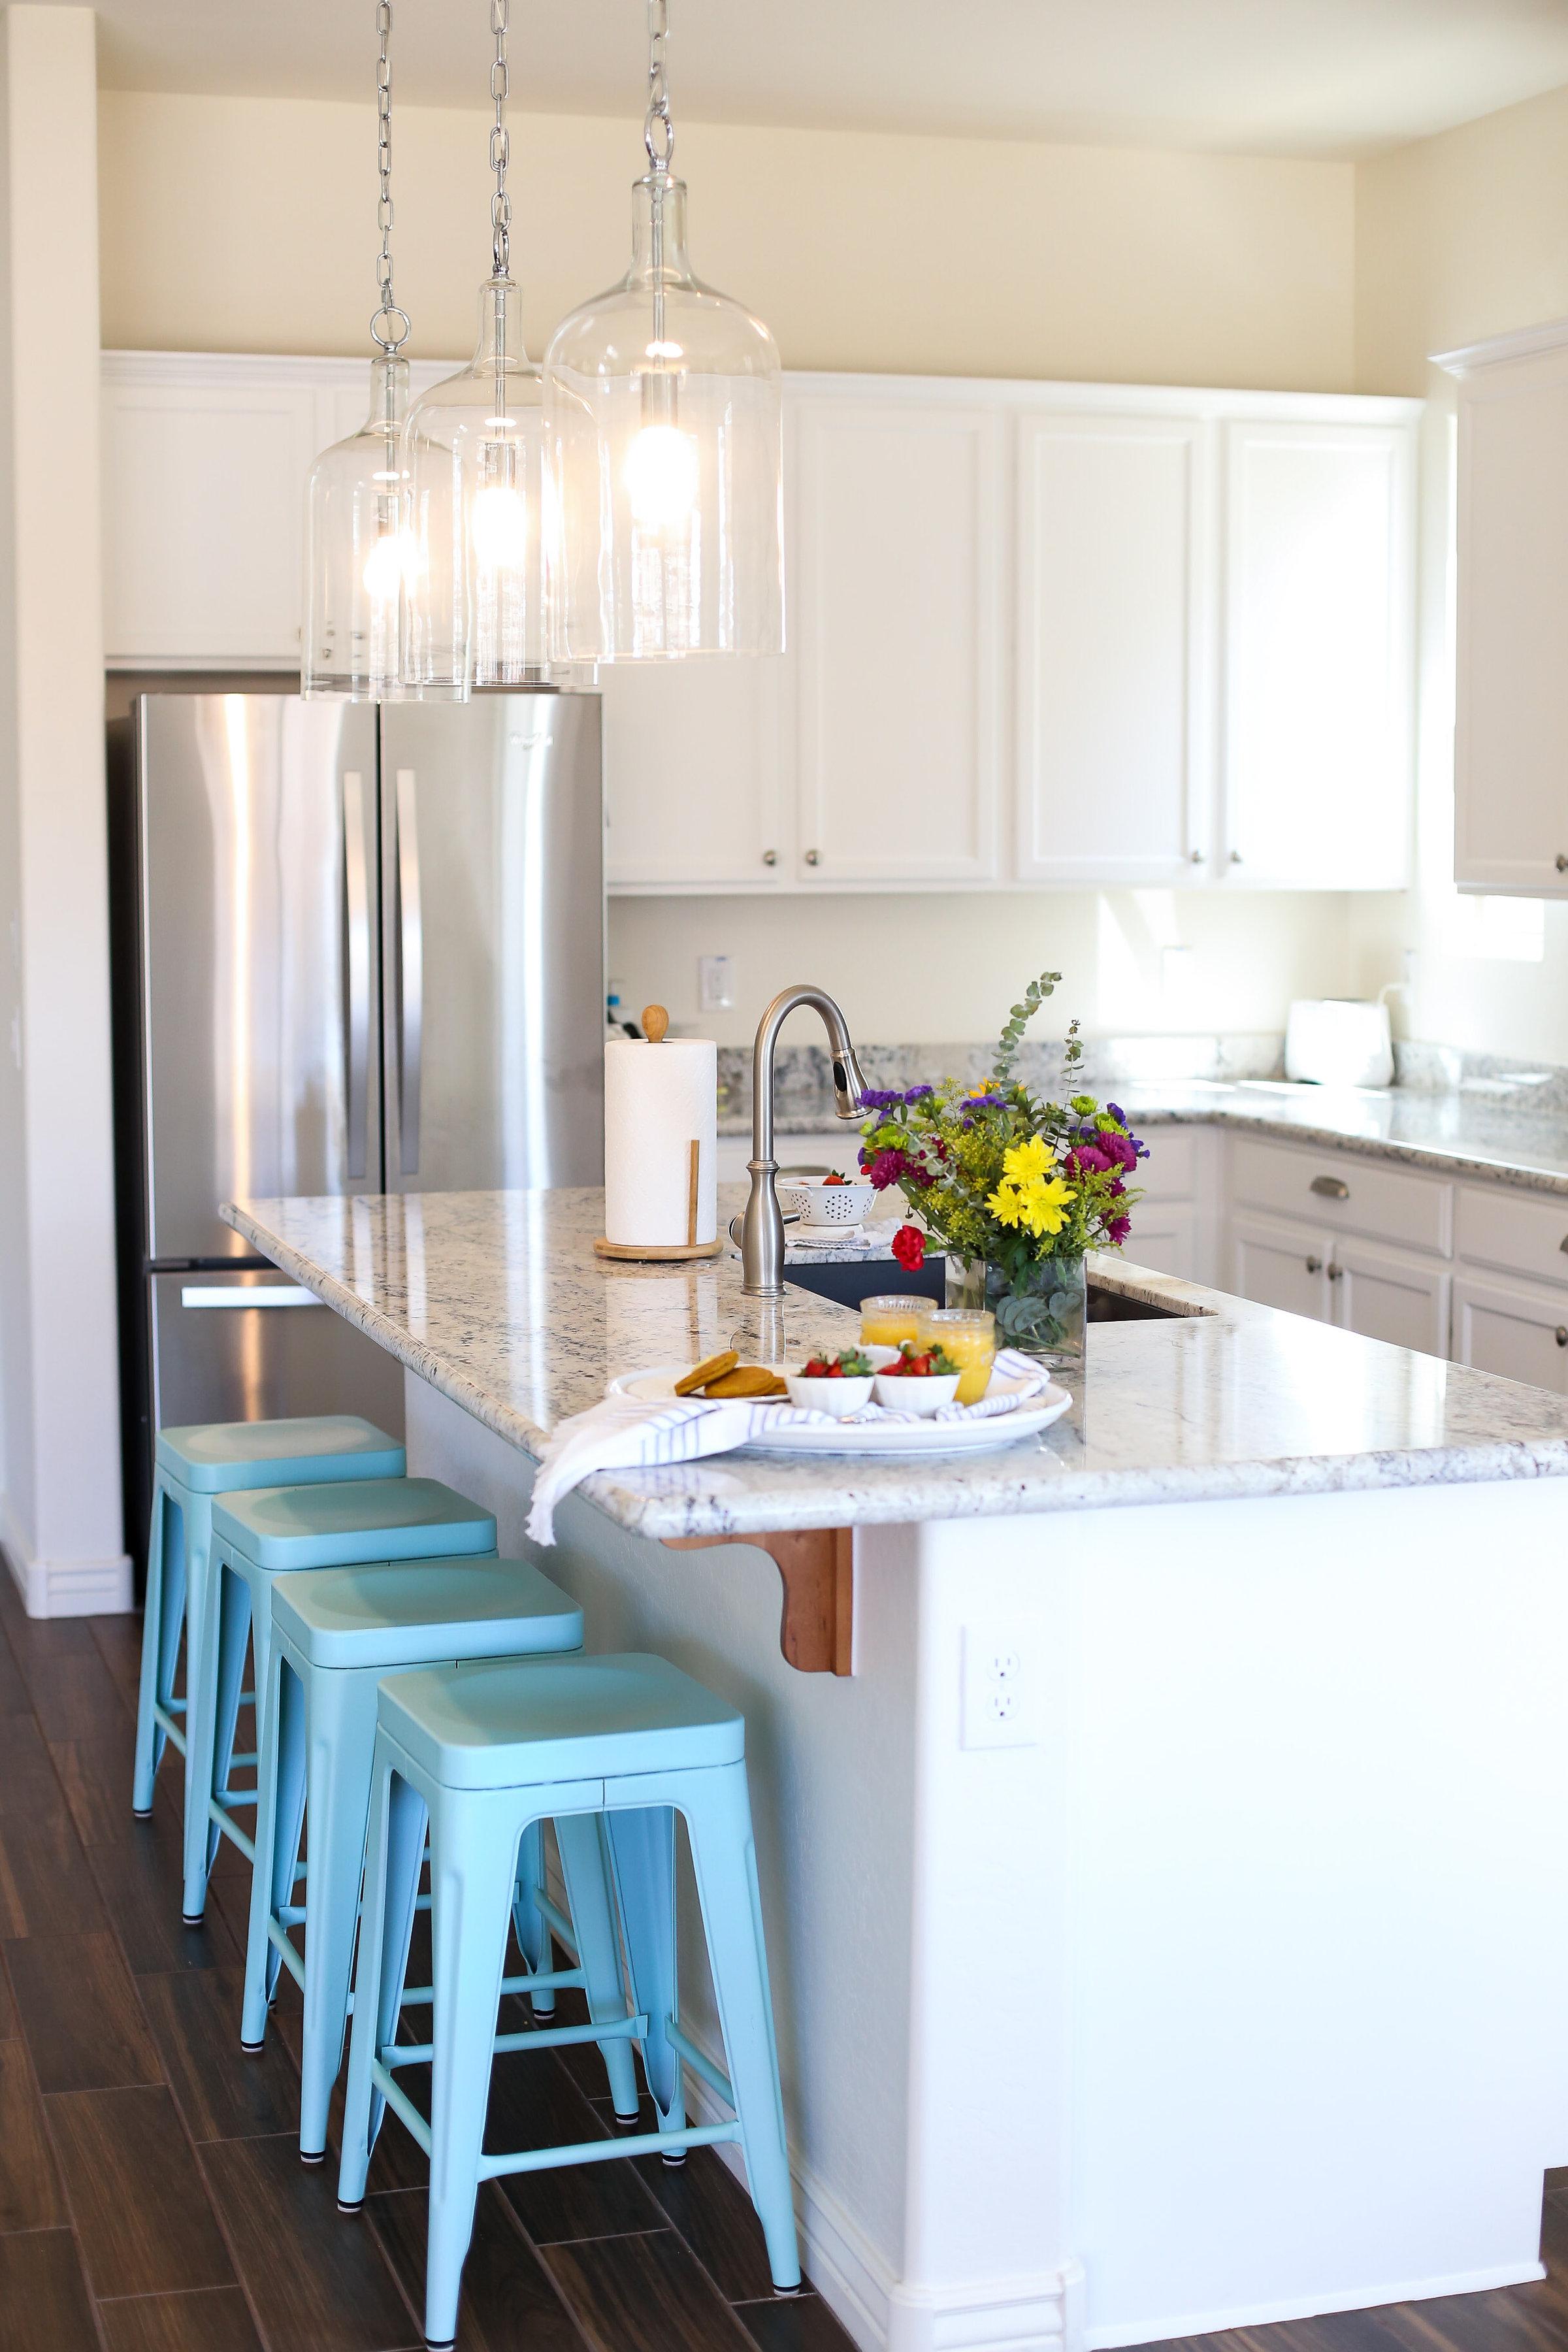 Capri pendants, aqua metal stools, wood tile, and white ice granite. I love this kitchen!